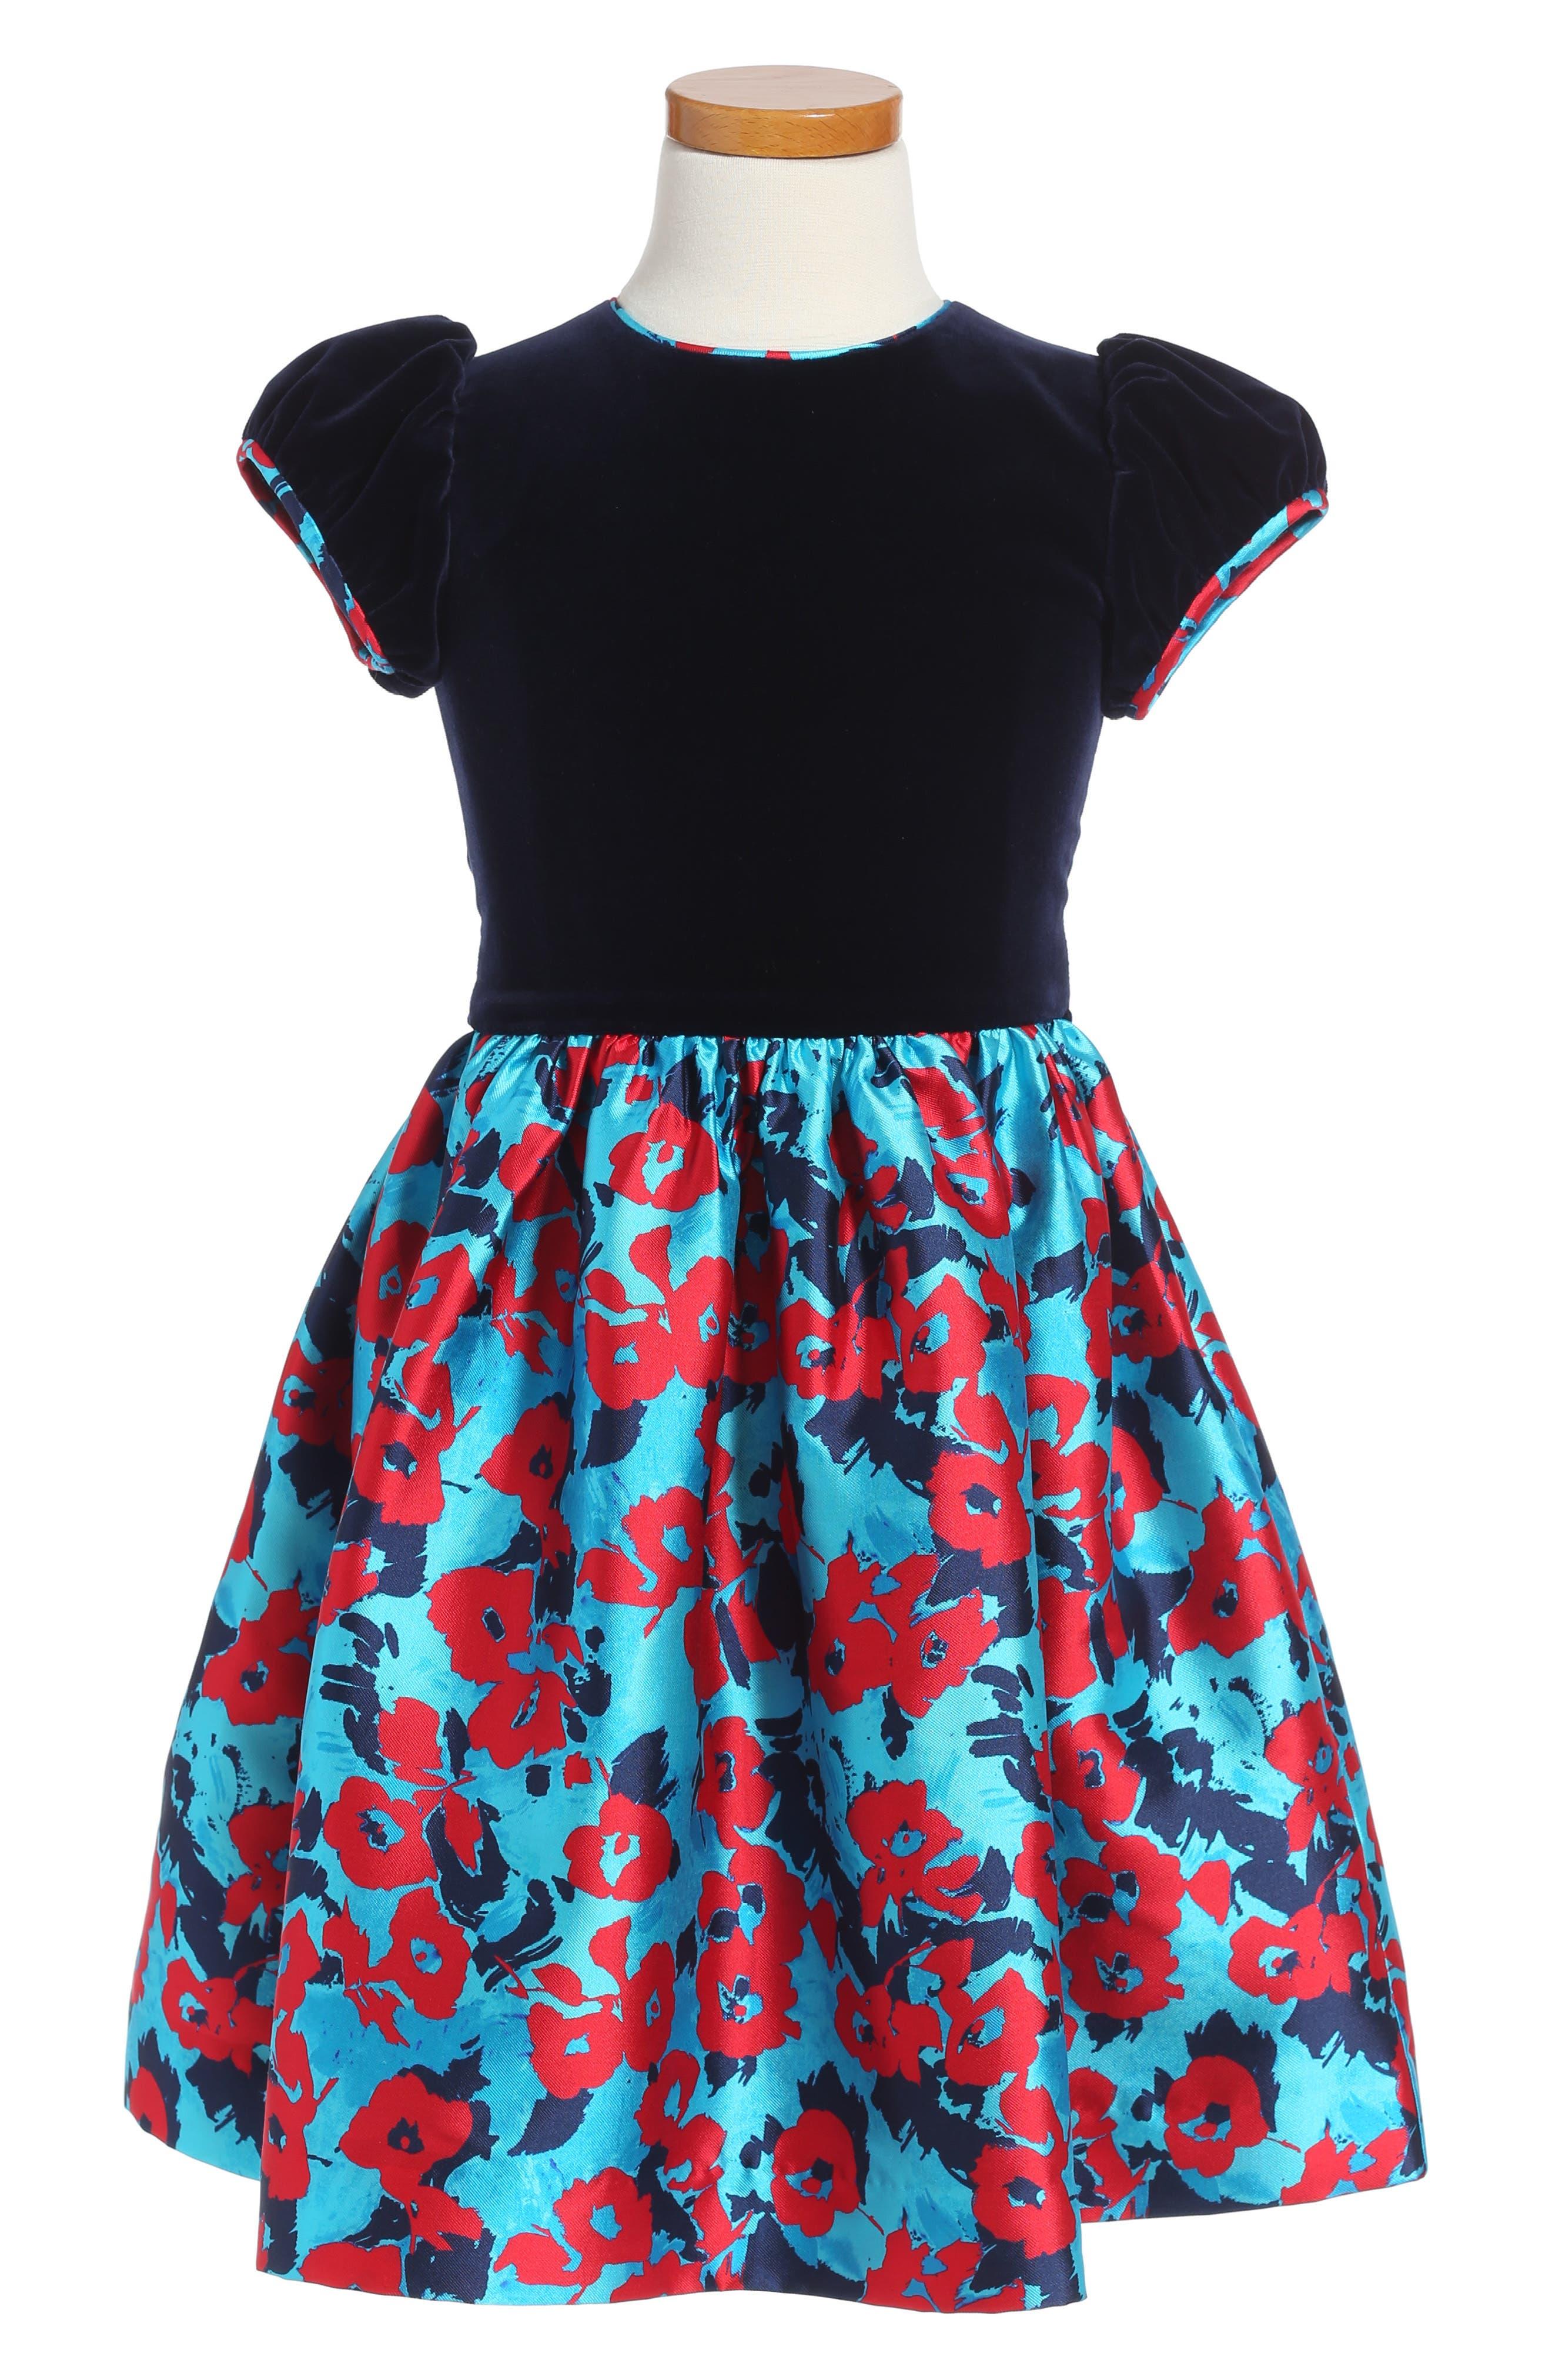 Main Image - Oscar de la Renta Wild Roses Mikado Party Dress (Toddler Girls &  Little Girls)